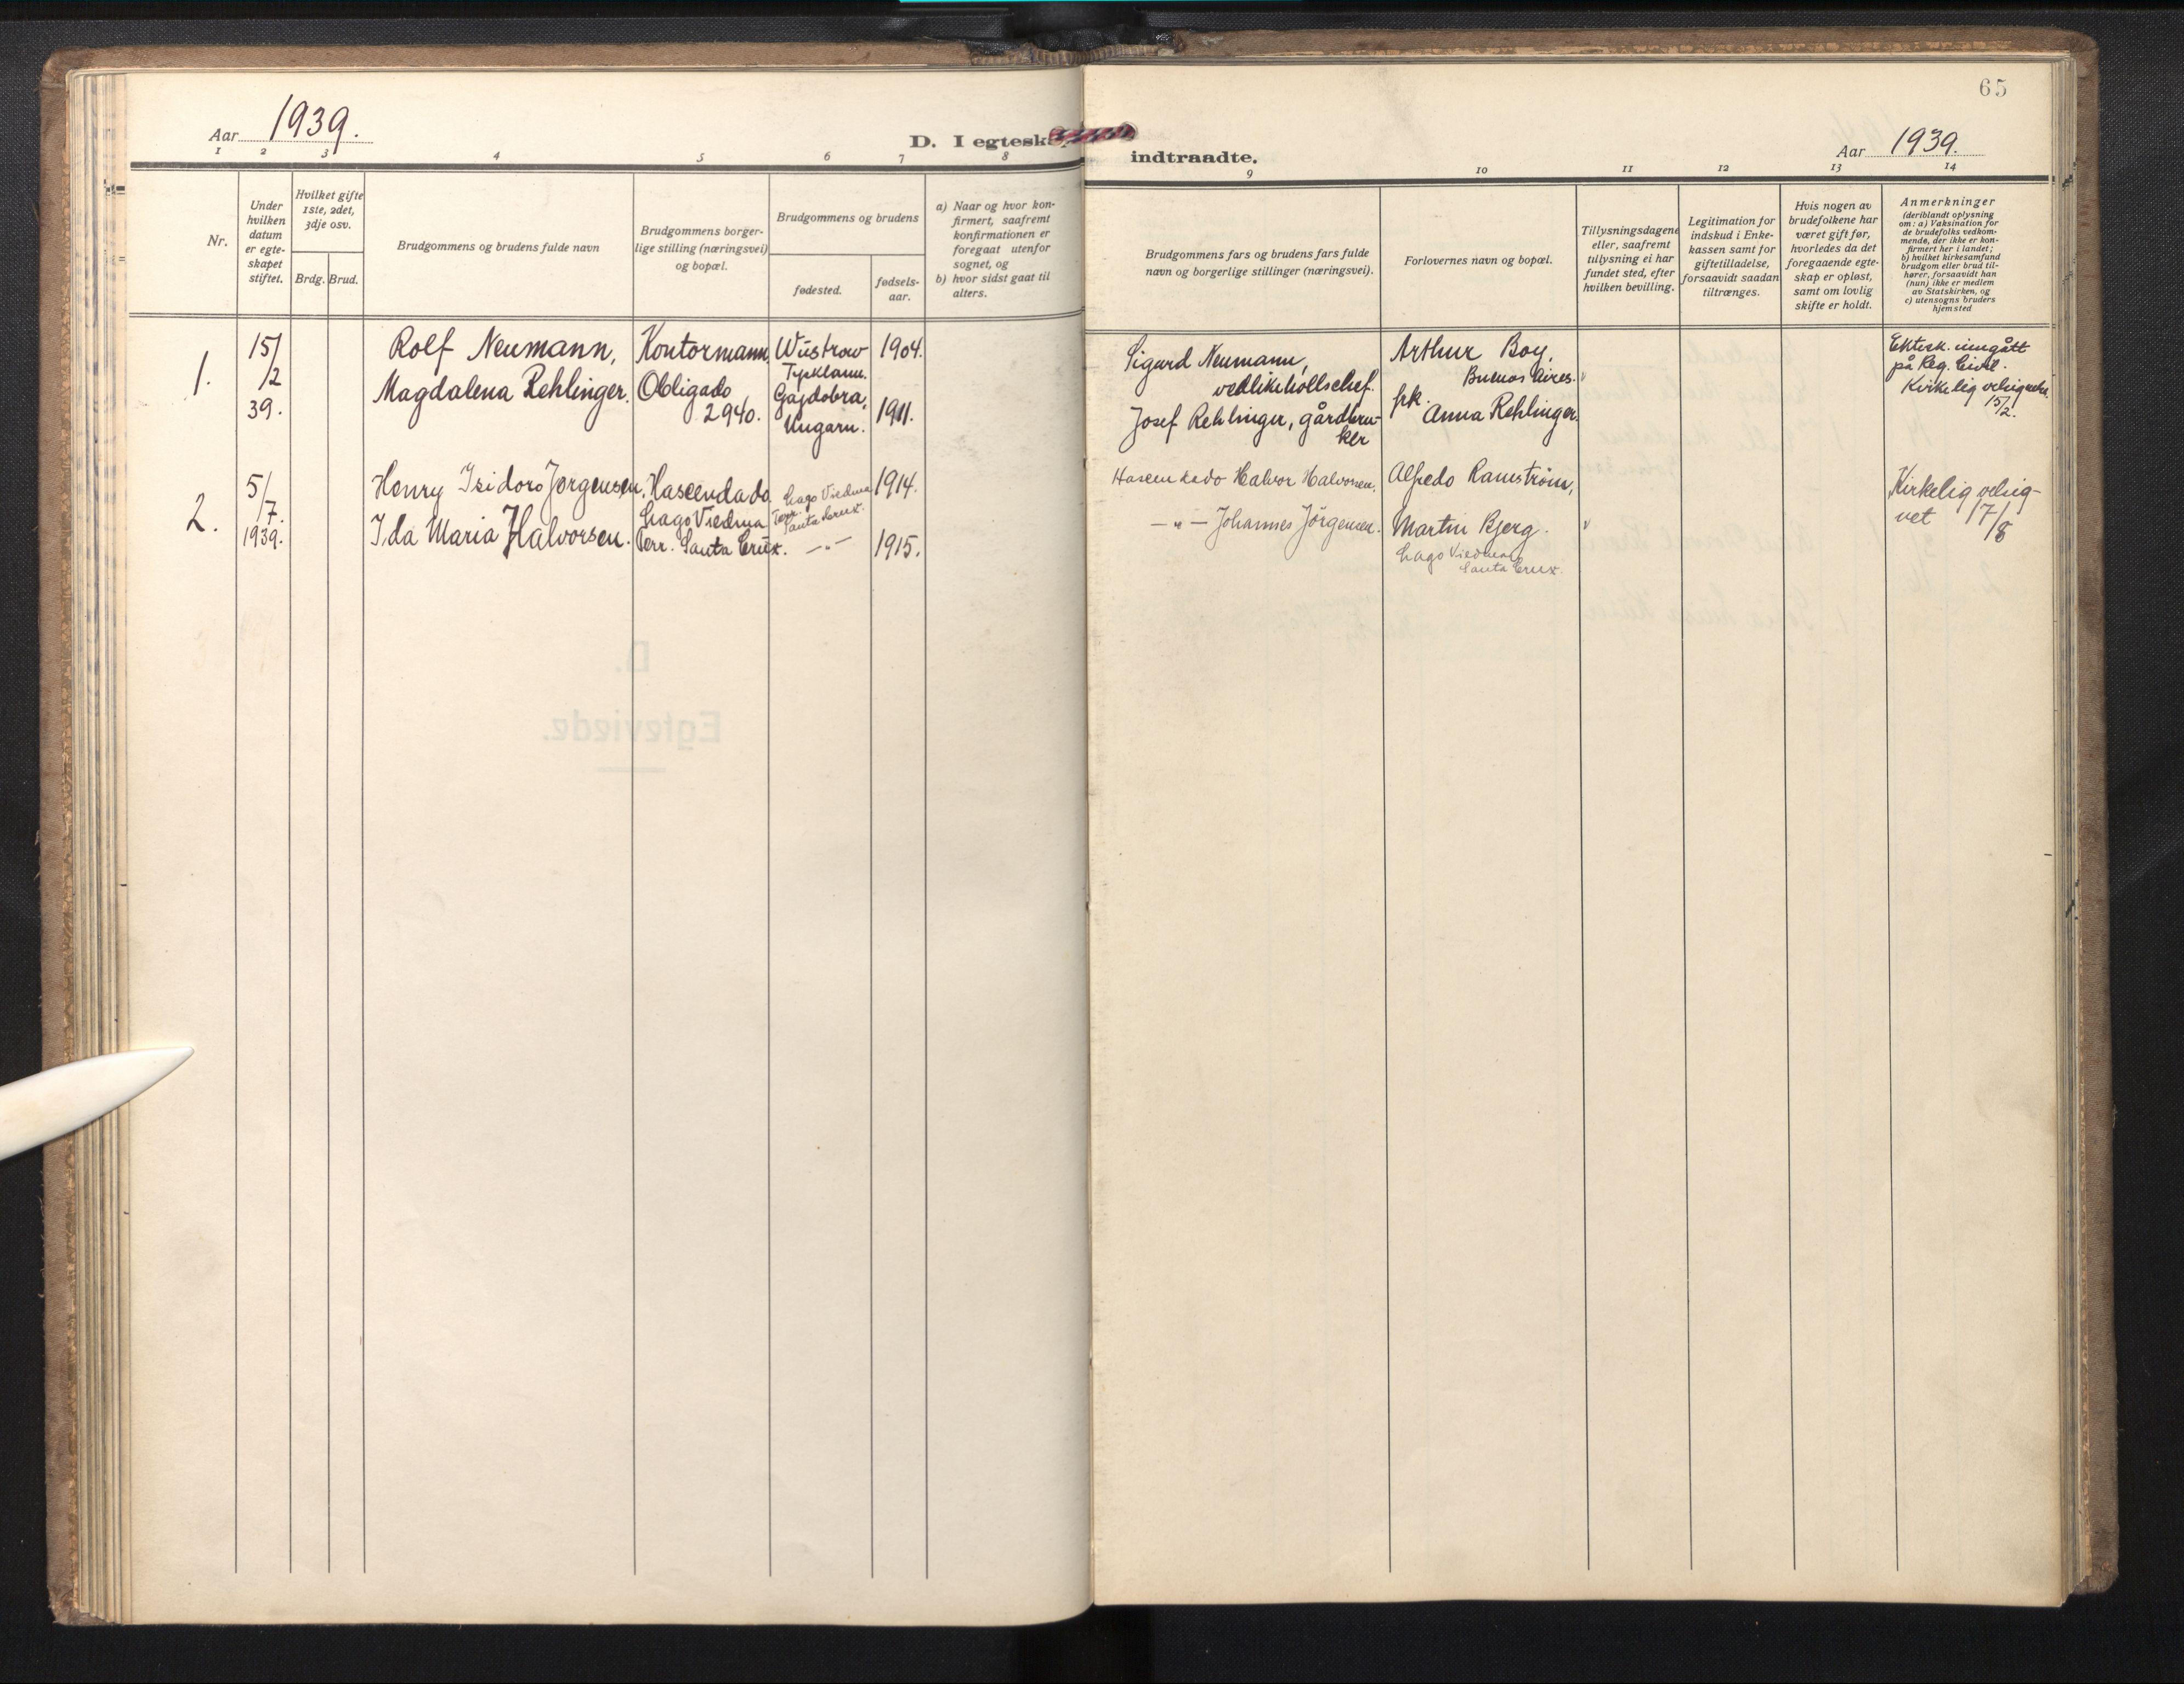 SAB, Den norske sjømannsmisjon i utlandet/Syd-Amerika (Buenos Aires m.fl.), H/Ha/L0004: Ministerialbok nr. A 4, 1938-1978, s. 64b-65a